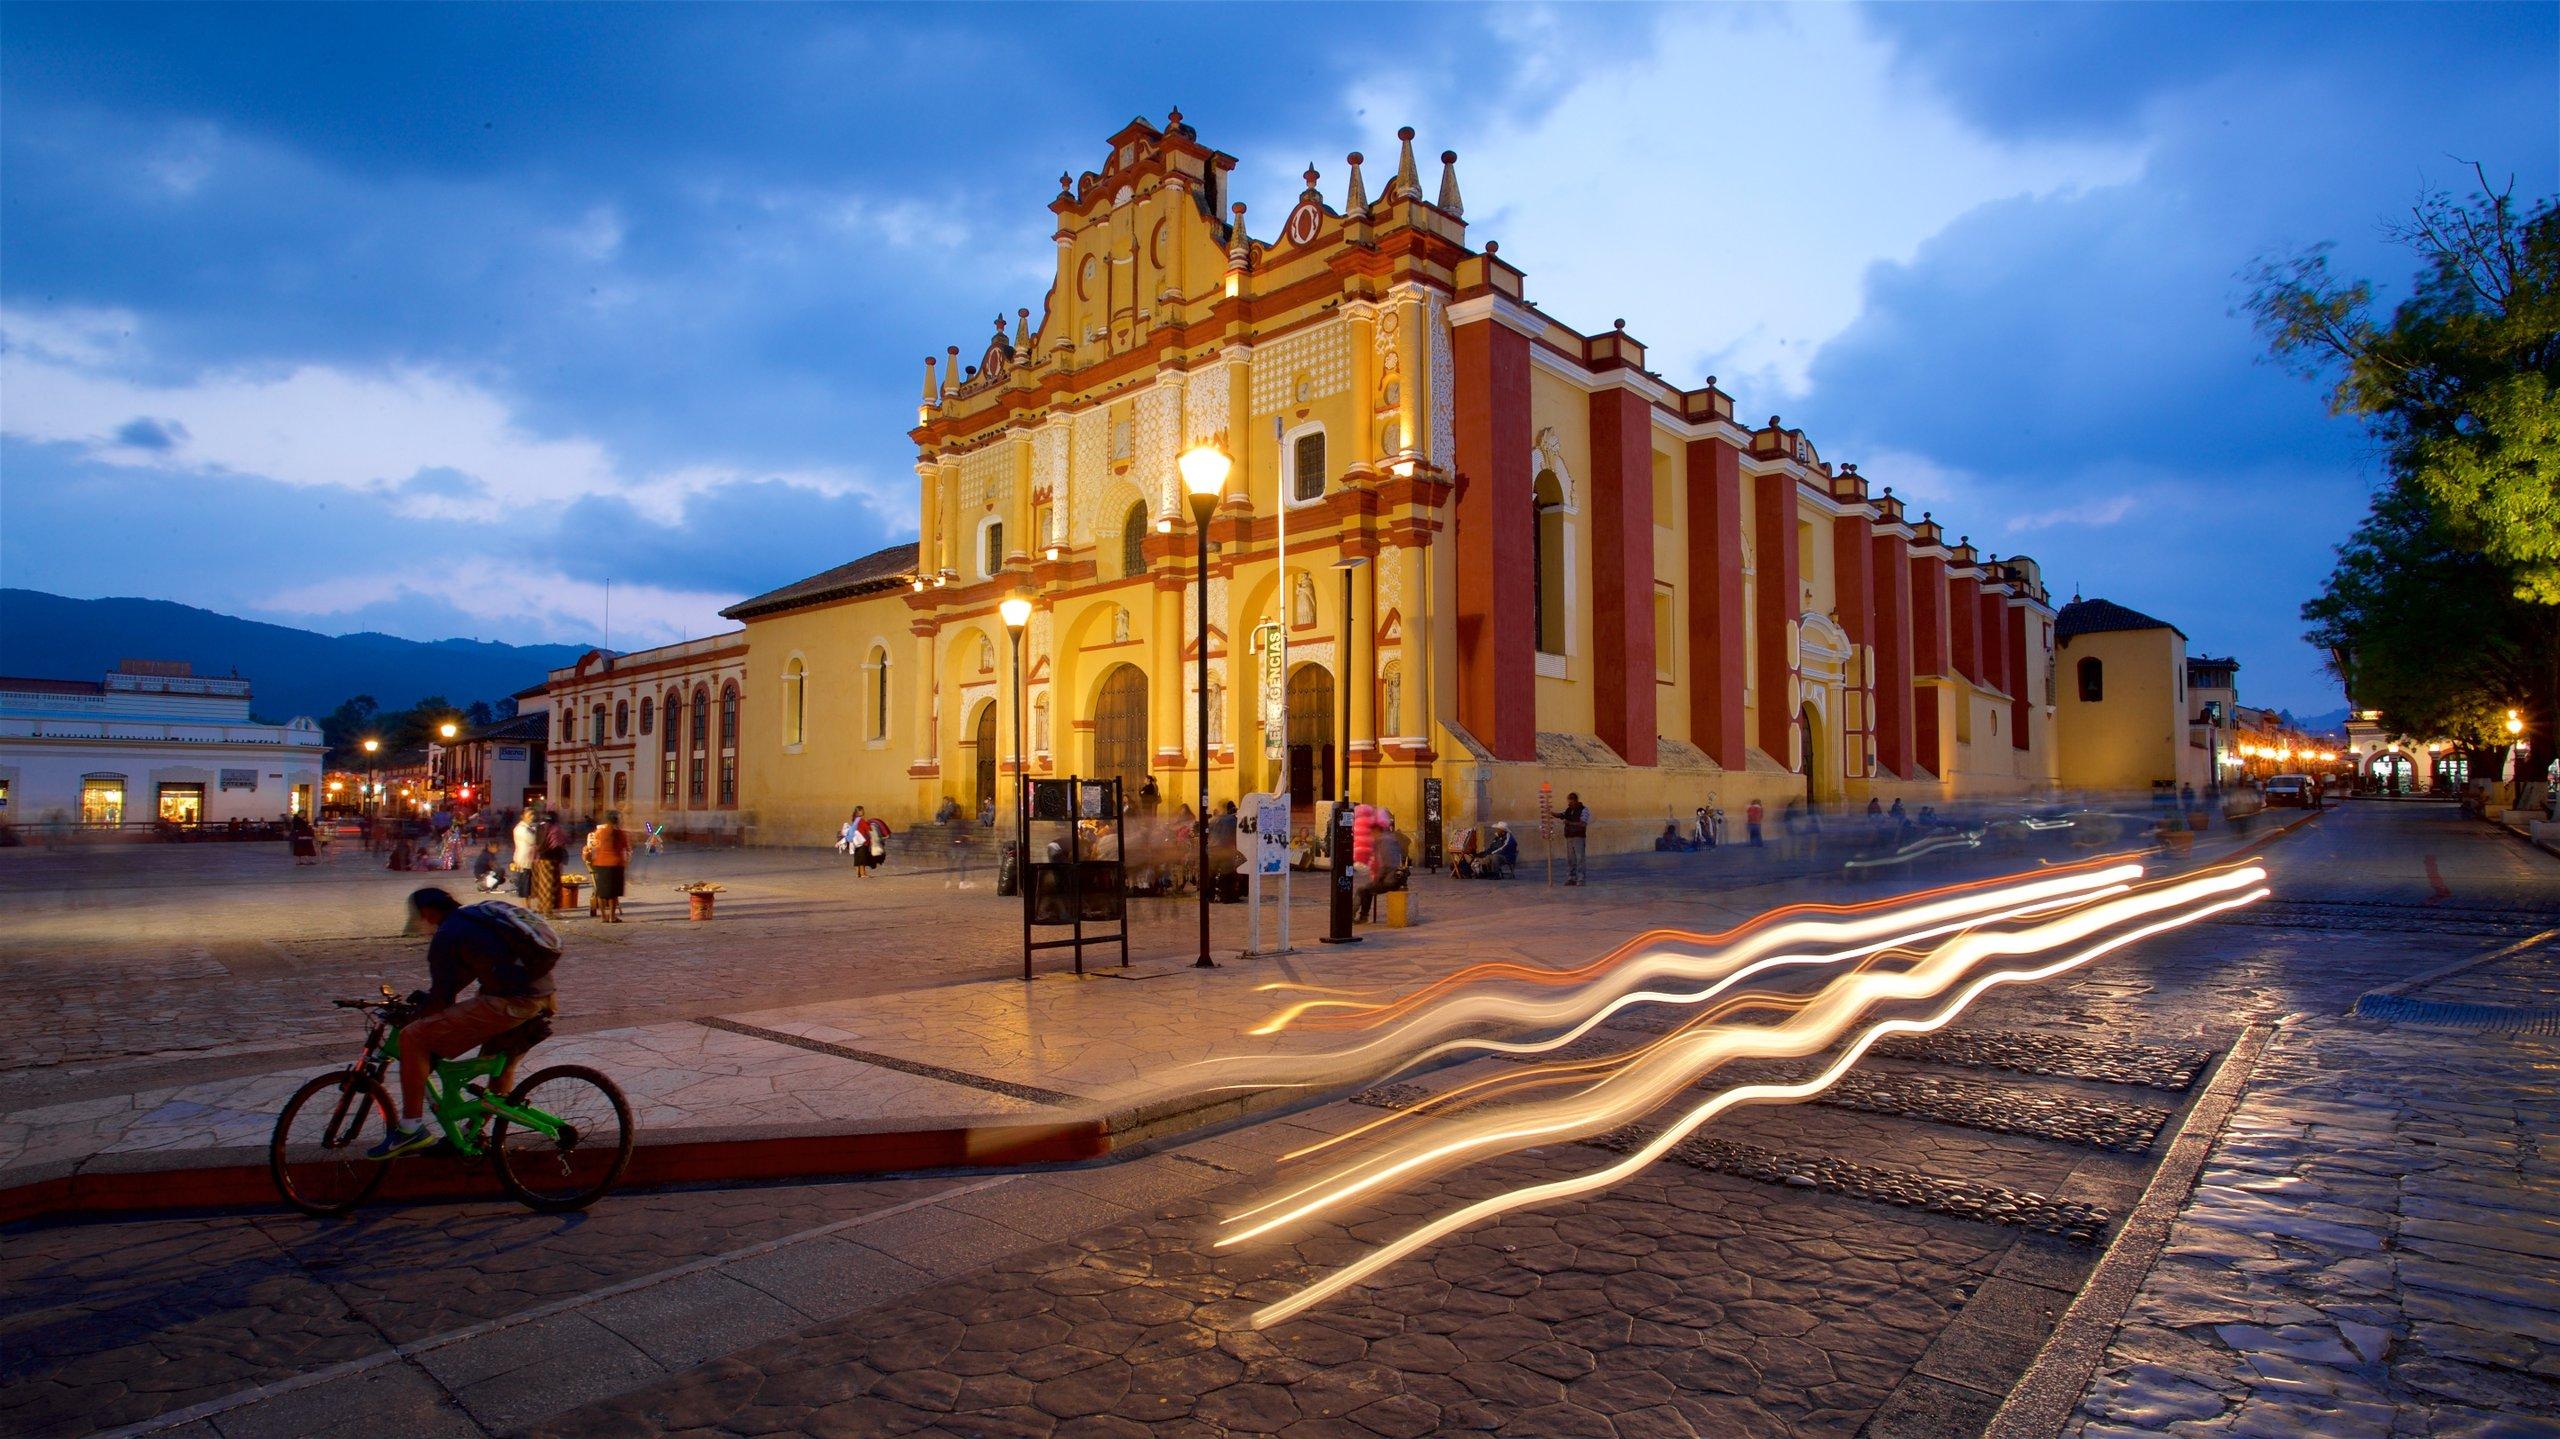 Hoteles en San Cristóbal de las Casas, 2021: cancelación GRATIS en hoteles  seleccionados | Expedia